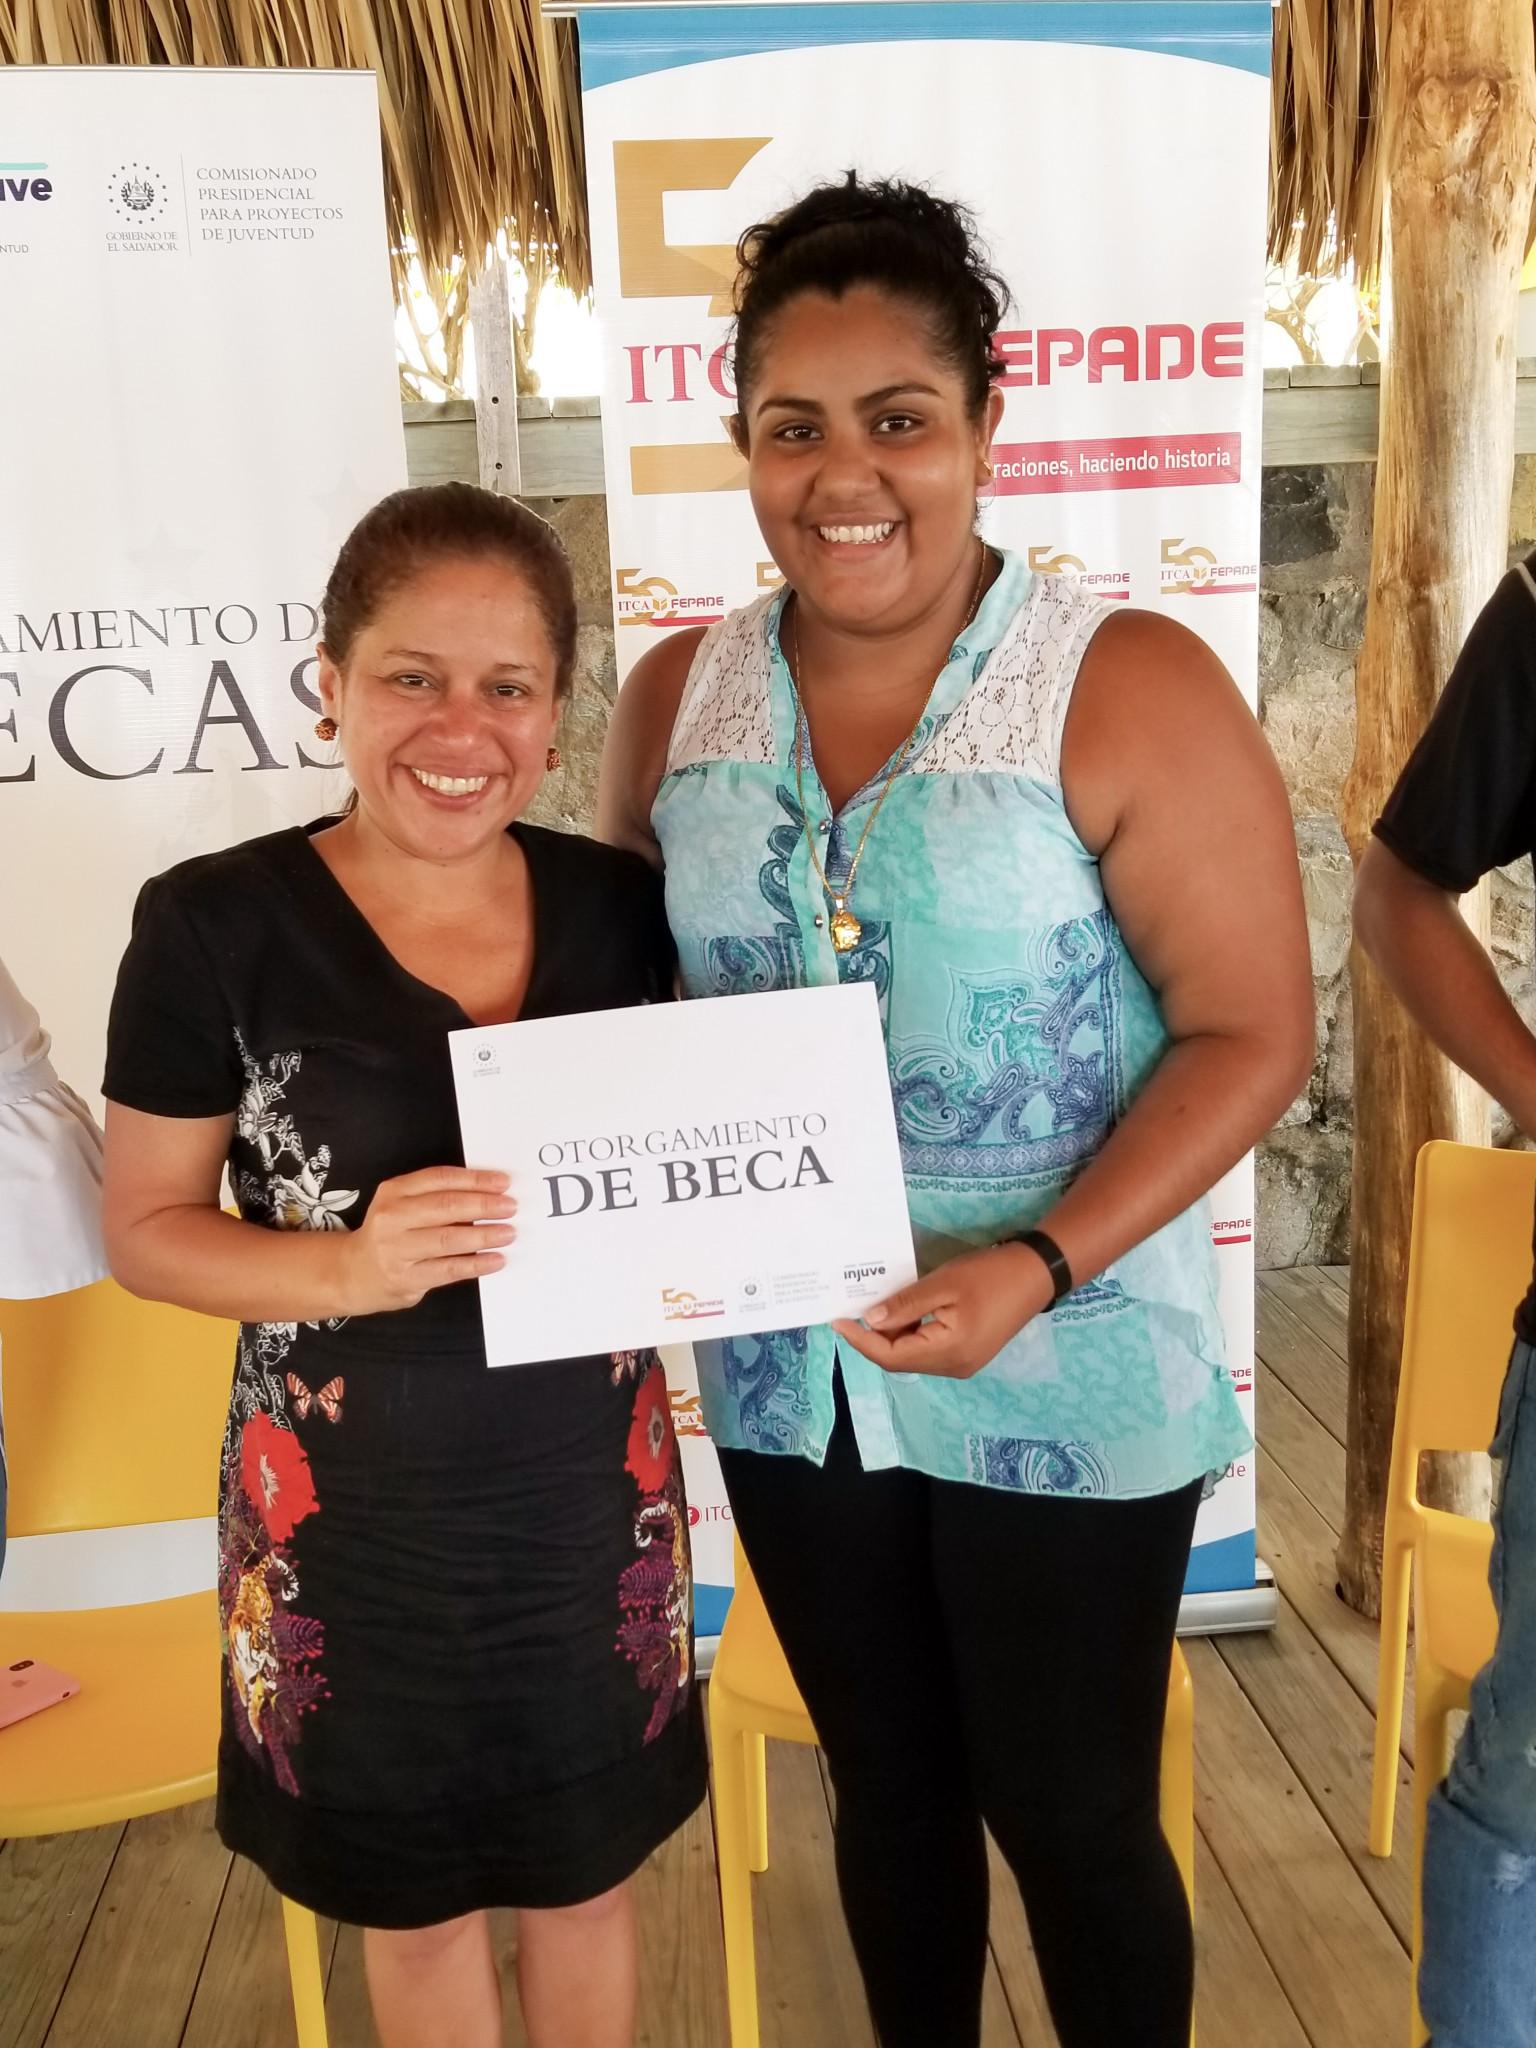 El Salvador's Minister for Tourism Morena Valdez, left, sees a bright future for her country after the ISA Championship ©El Salvador Ministry of Tourism